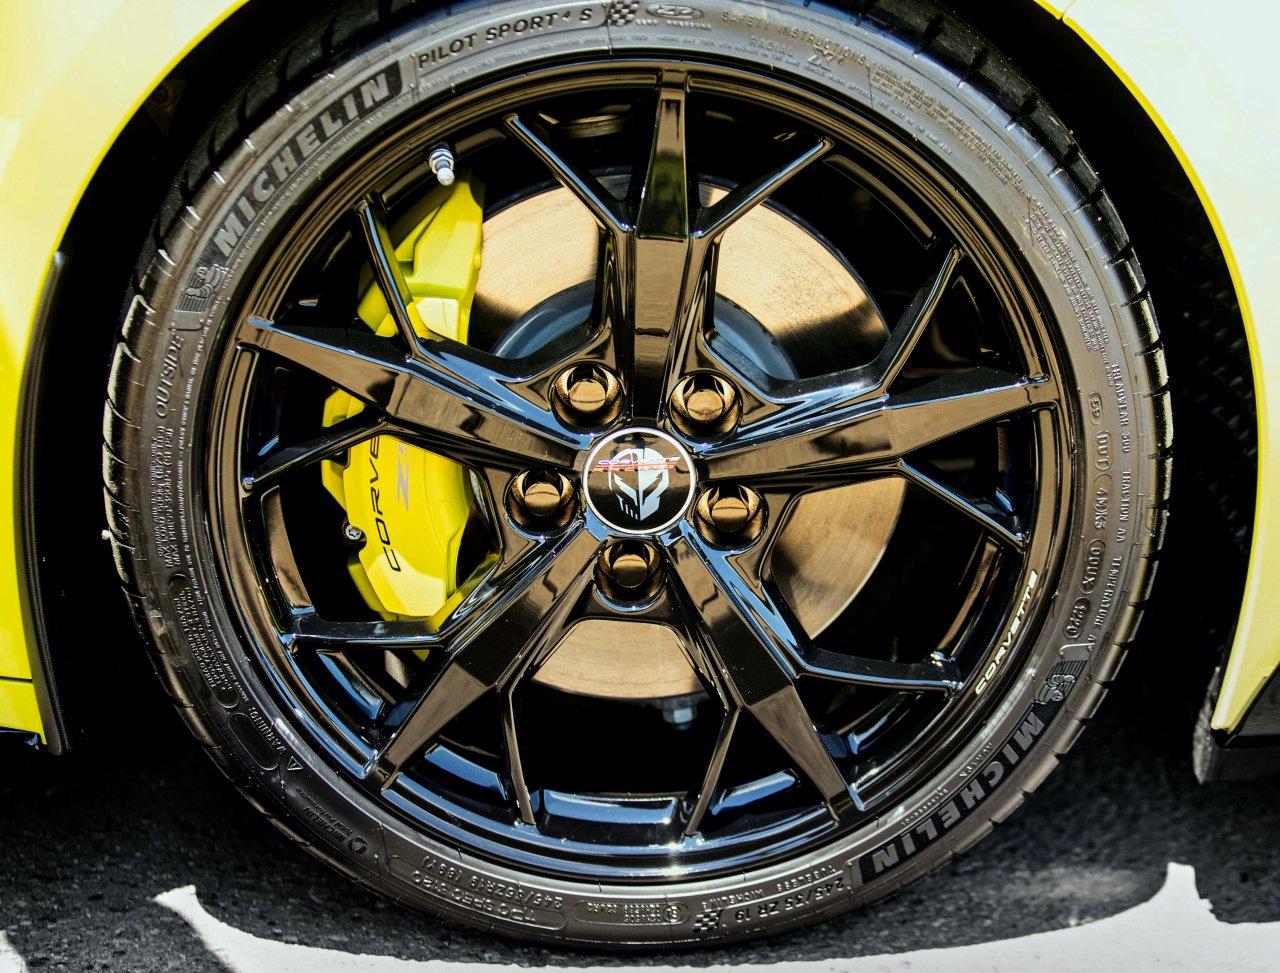 Corvette, Chevy plans IMSA edition for its 2022 Corvette, ClassicCars.com Journal